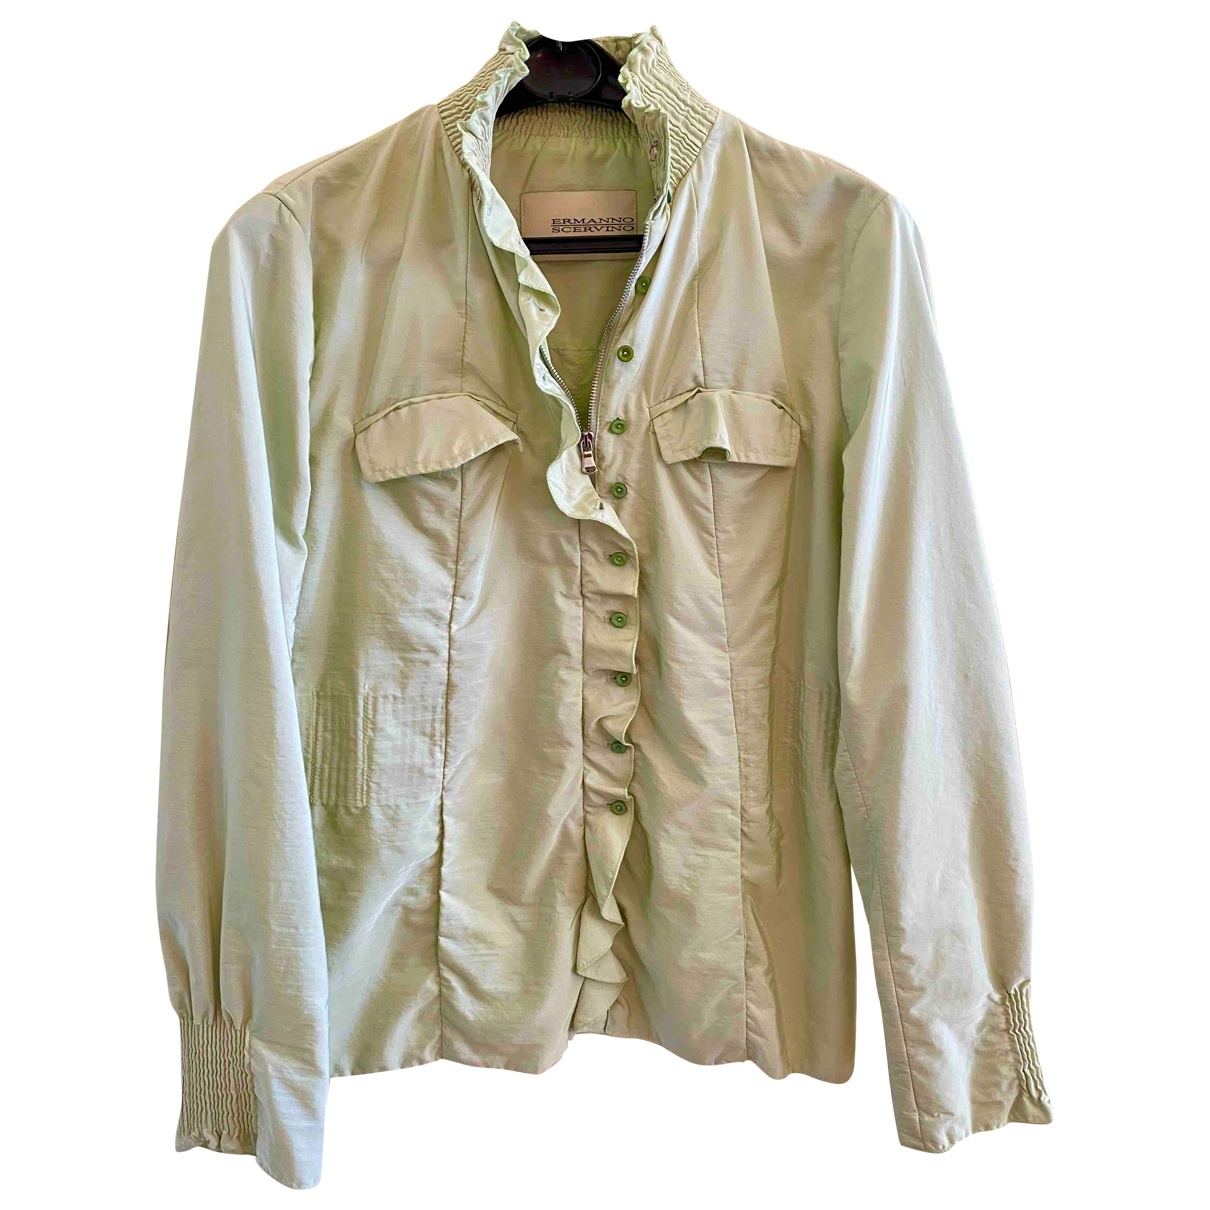 Ermanno Scervino \N jacket for Women 46 IT